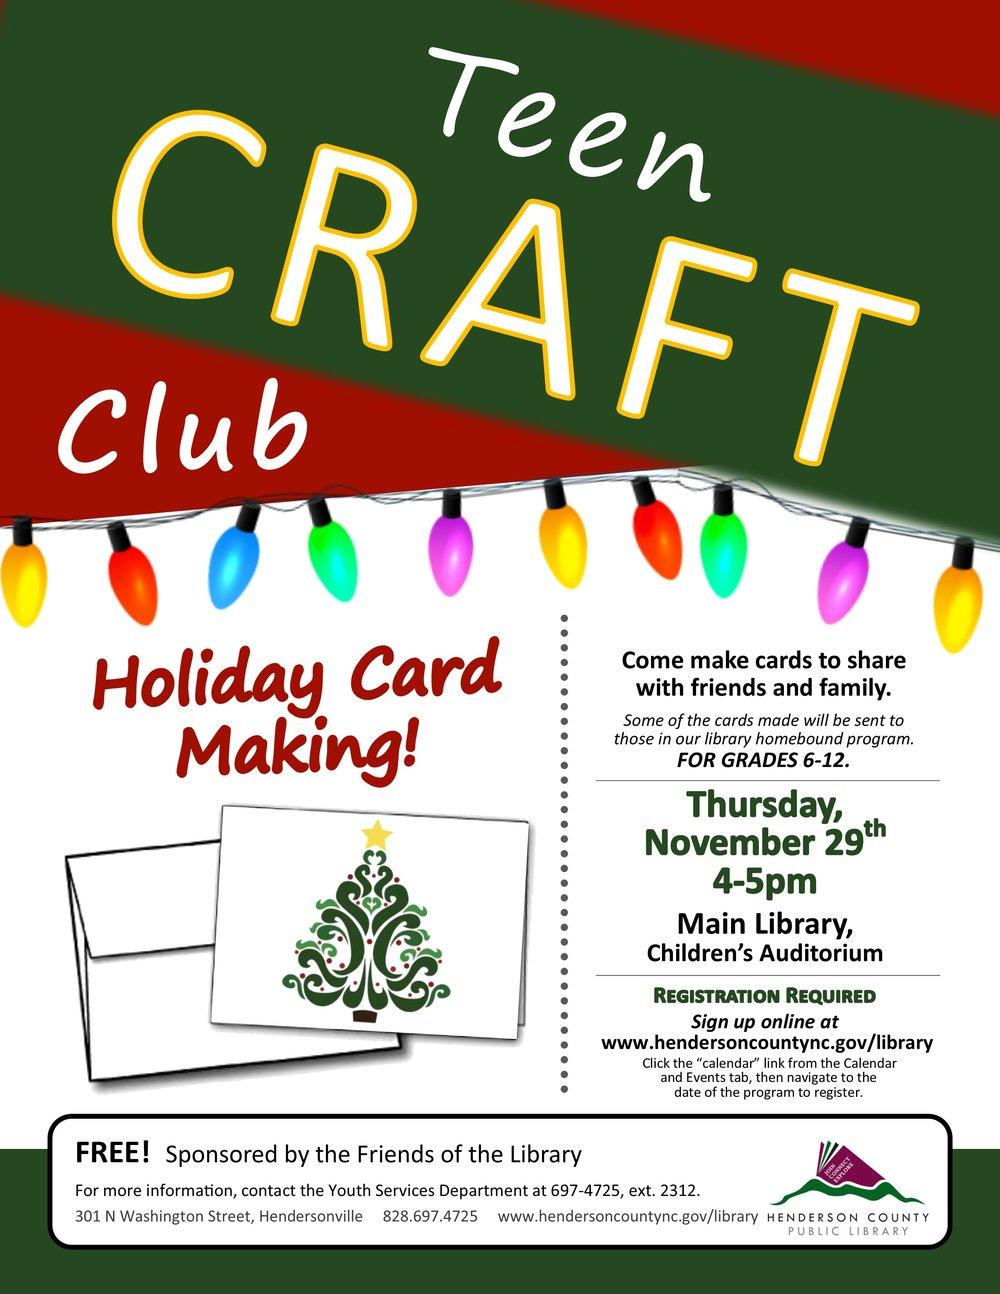 Teen Craft Club Holiday Card Making.jpg